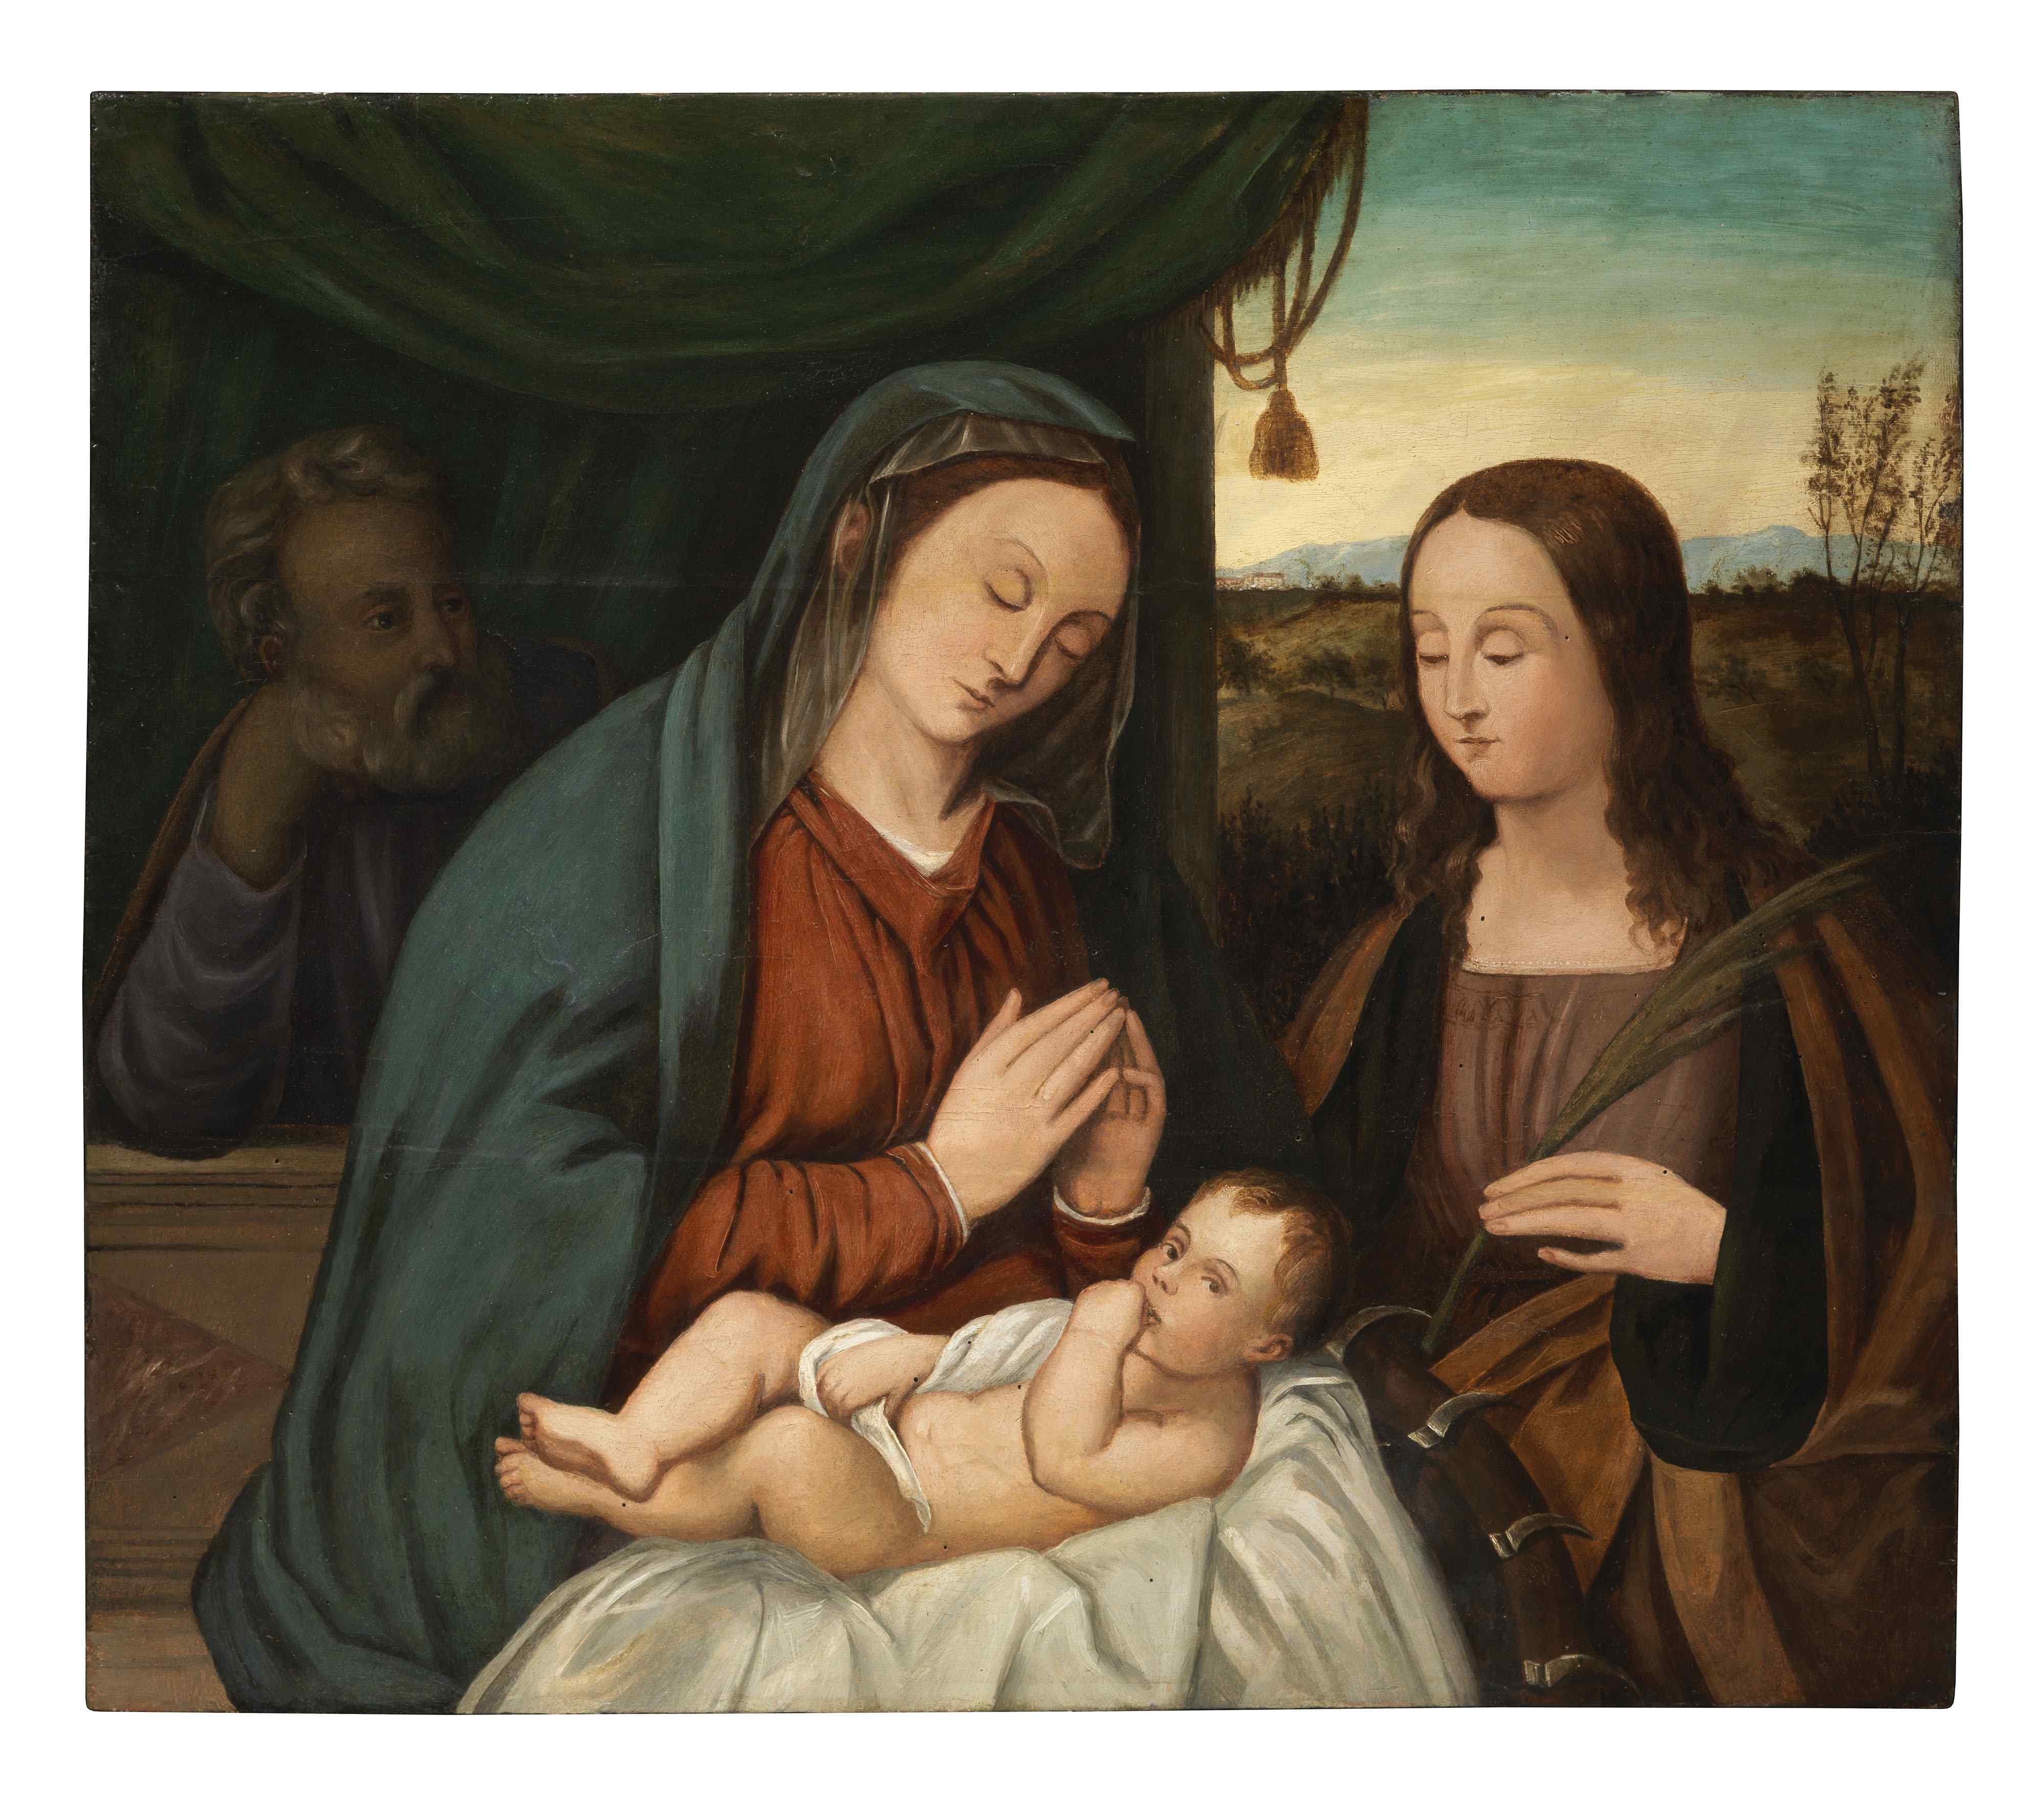 Francesco Rizzo da Santacroce (1485-1545) - Sainte Famille